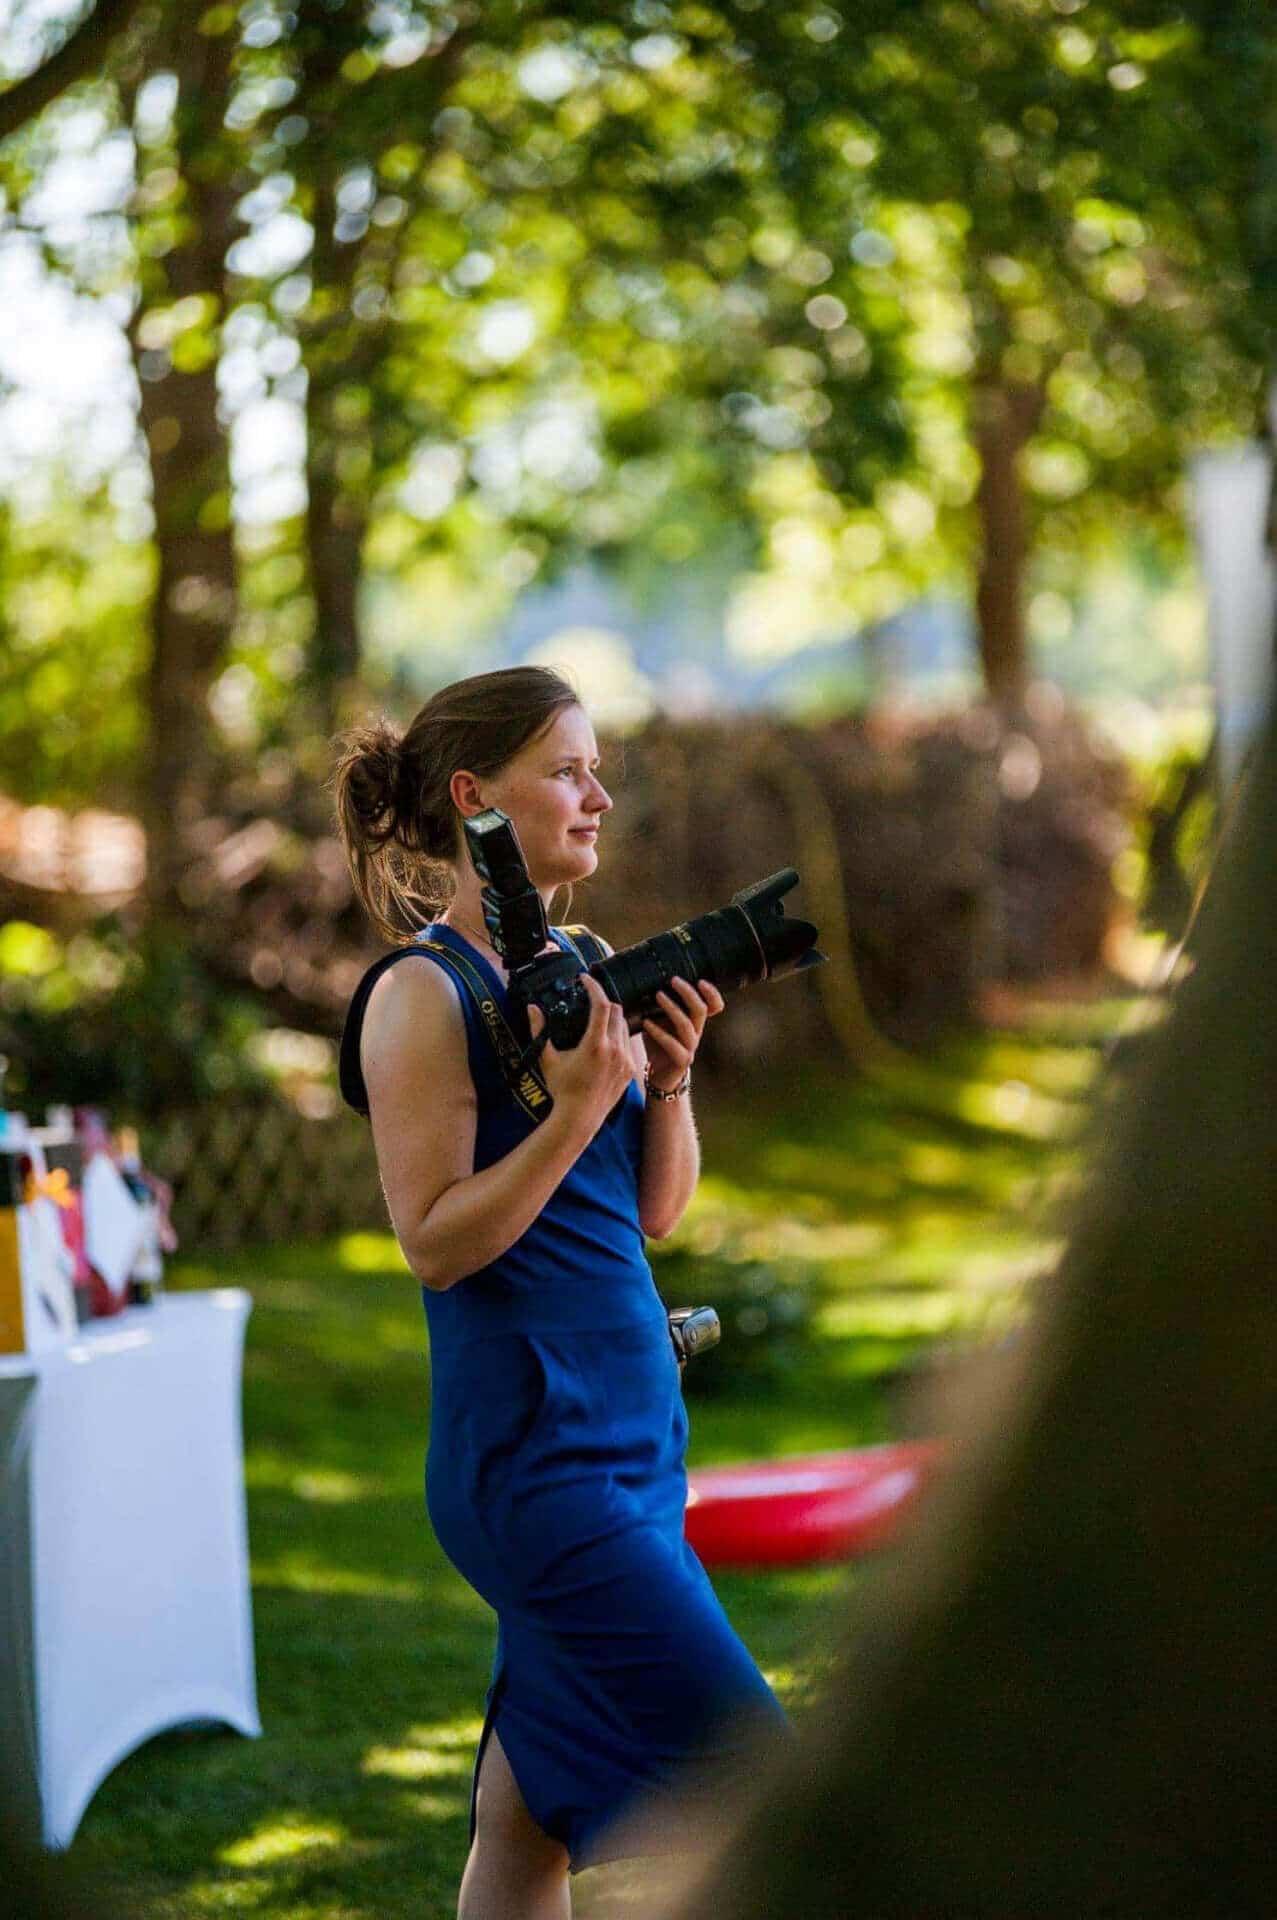 Portret Grietje Mesman tijdens bruiloft